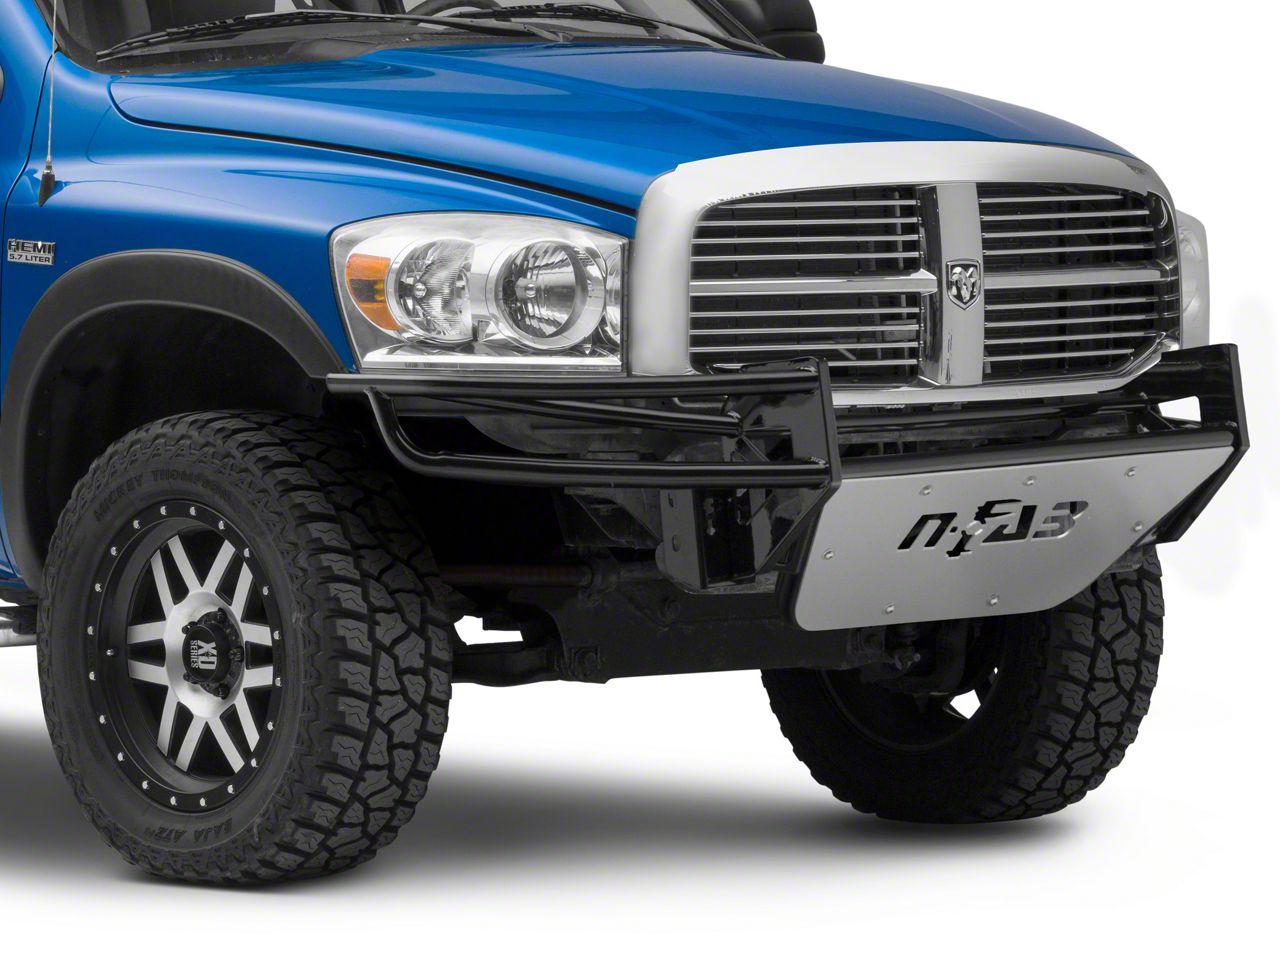 N-Fab R.S.P. Pre-Runner Front Bumper - Gloss Black (02-08 RAM 1500 Regular Cab, Quad Cab)